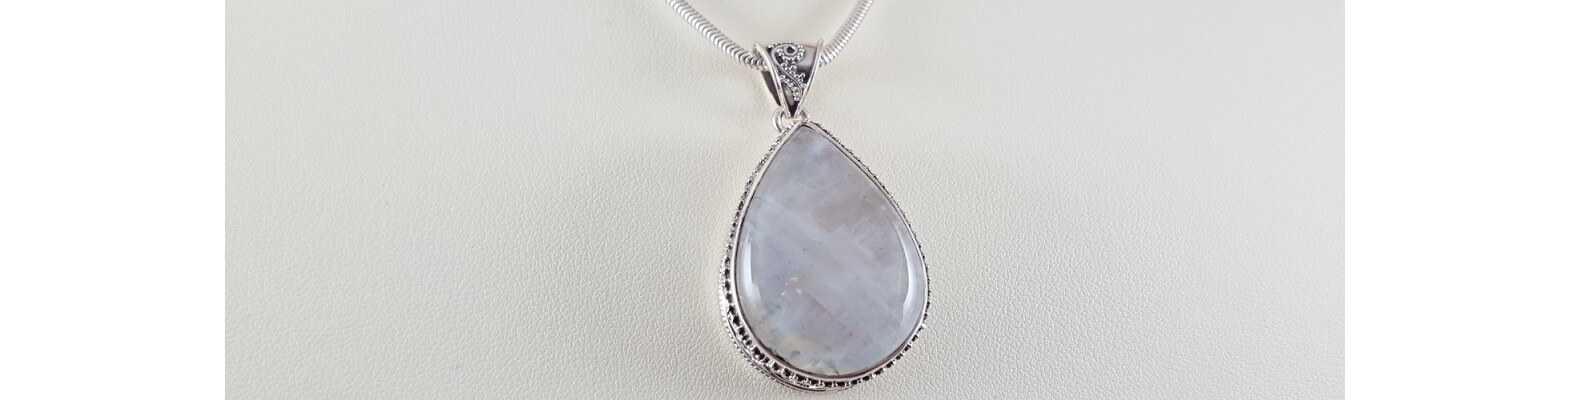 Silver Gemstone Pendants